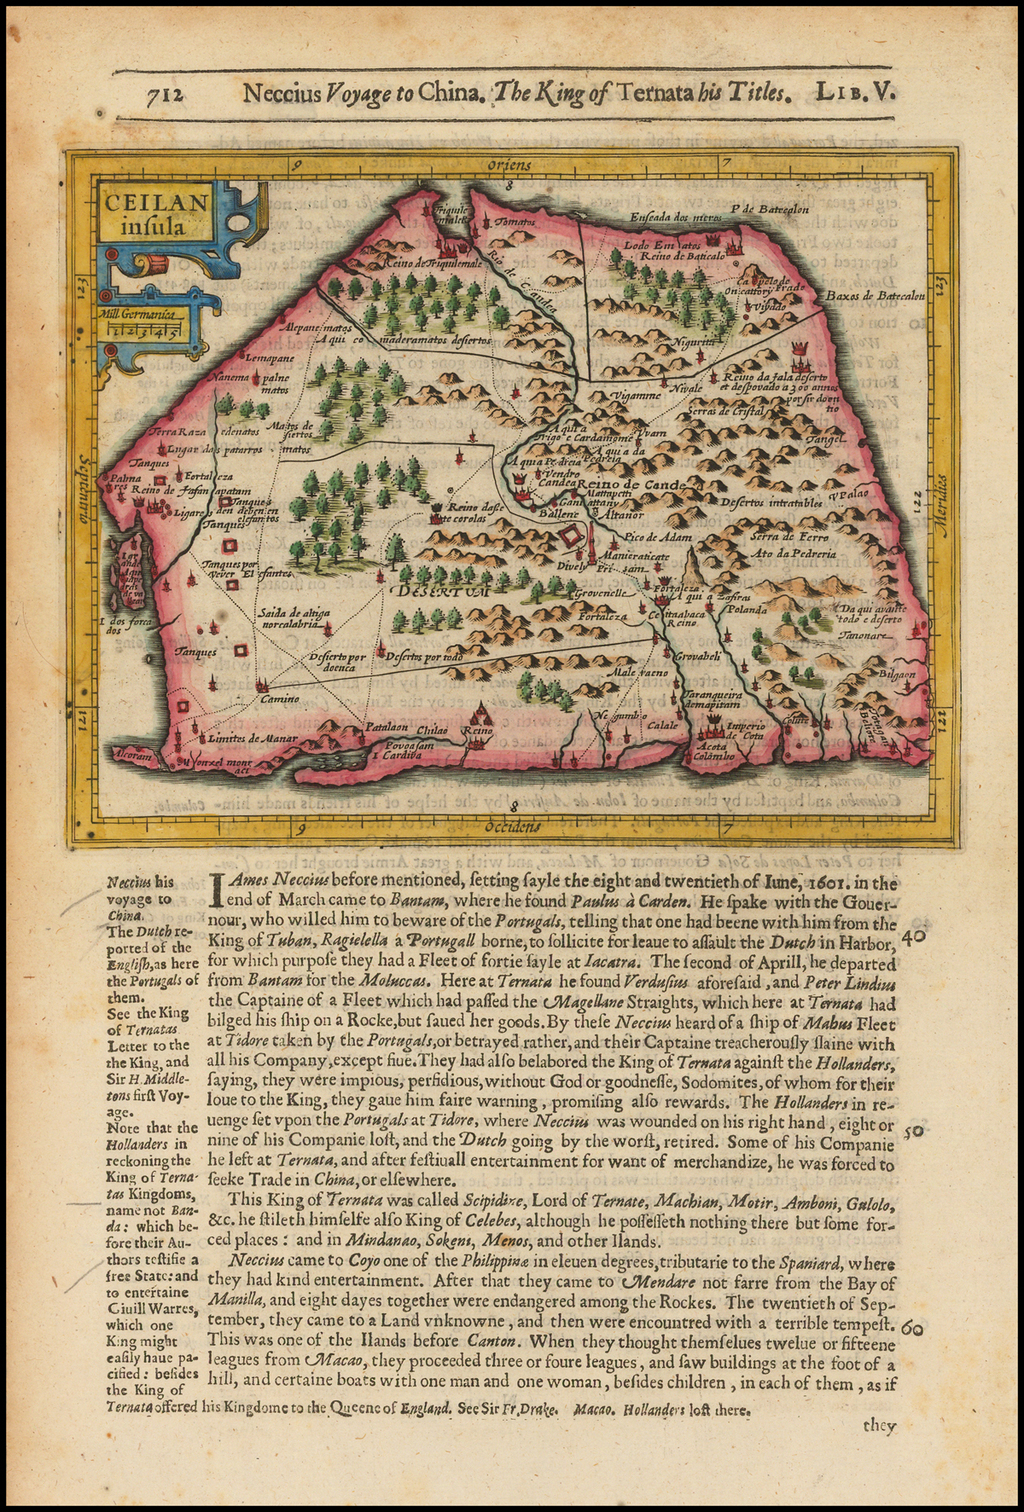 Ceilan insula By Jodocus Hondius / Samuel Purchas